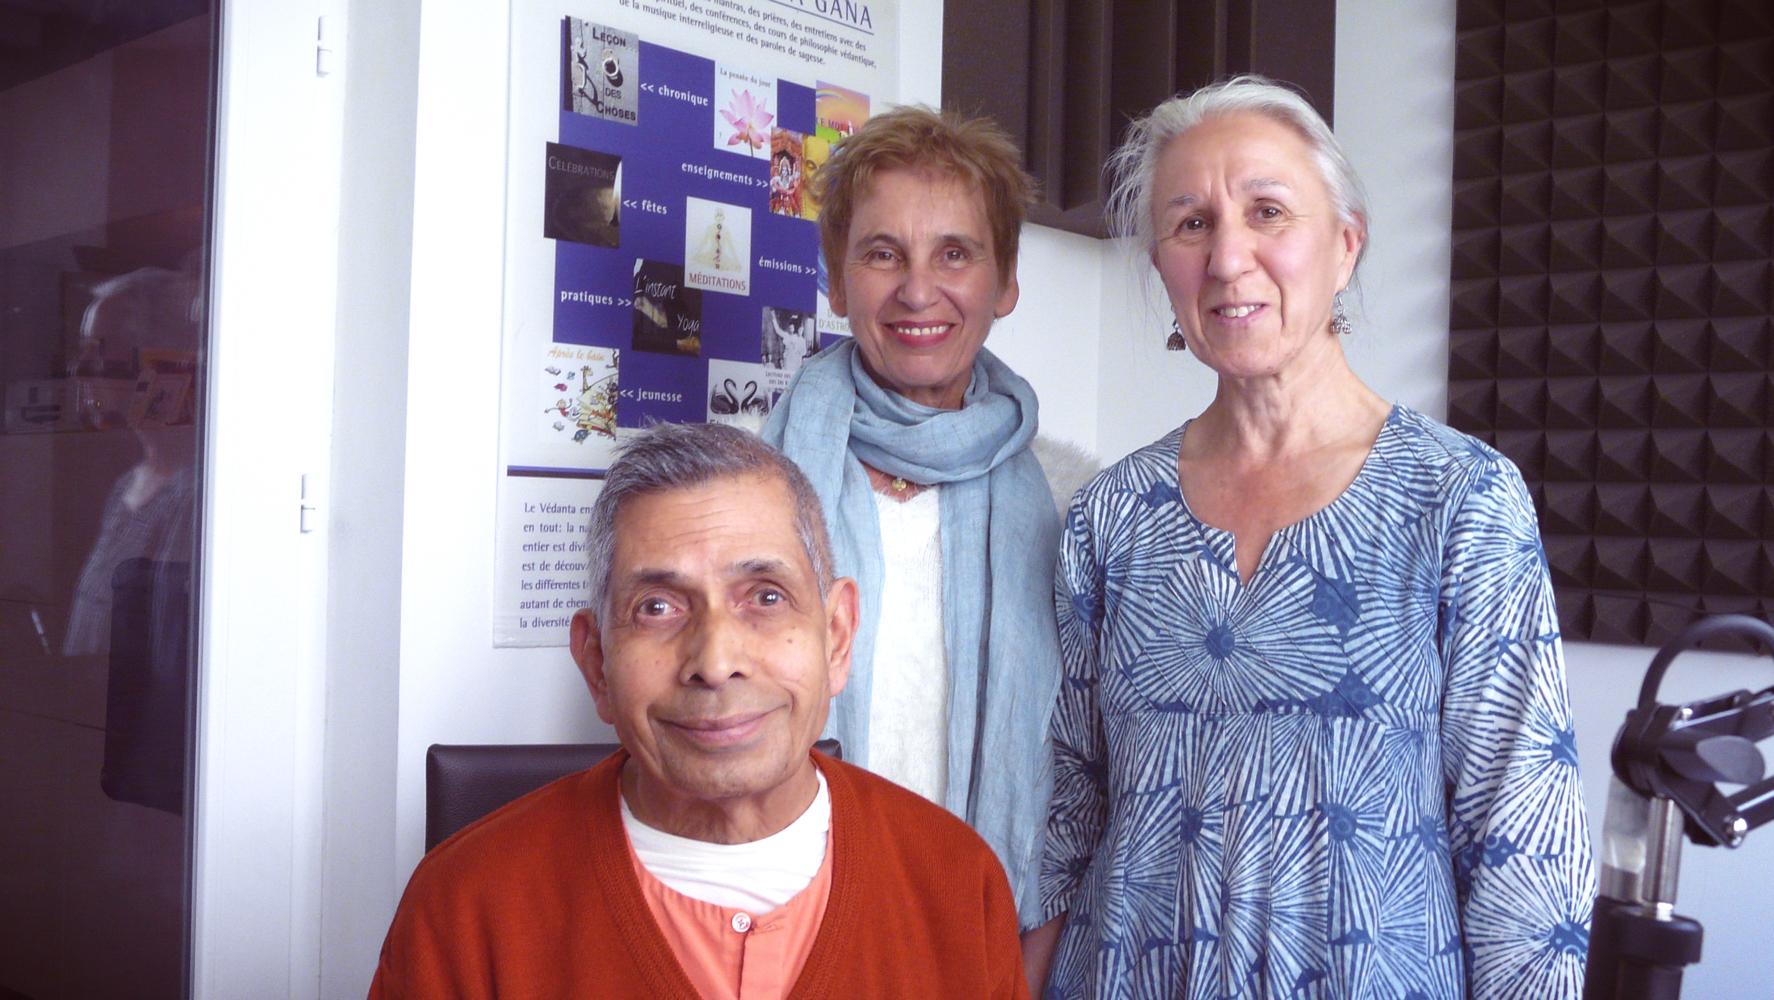 Swami Veetamohananda, Martine et Ulrika